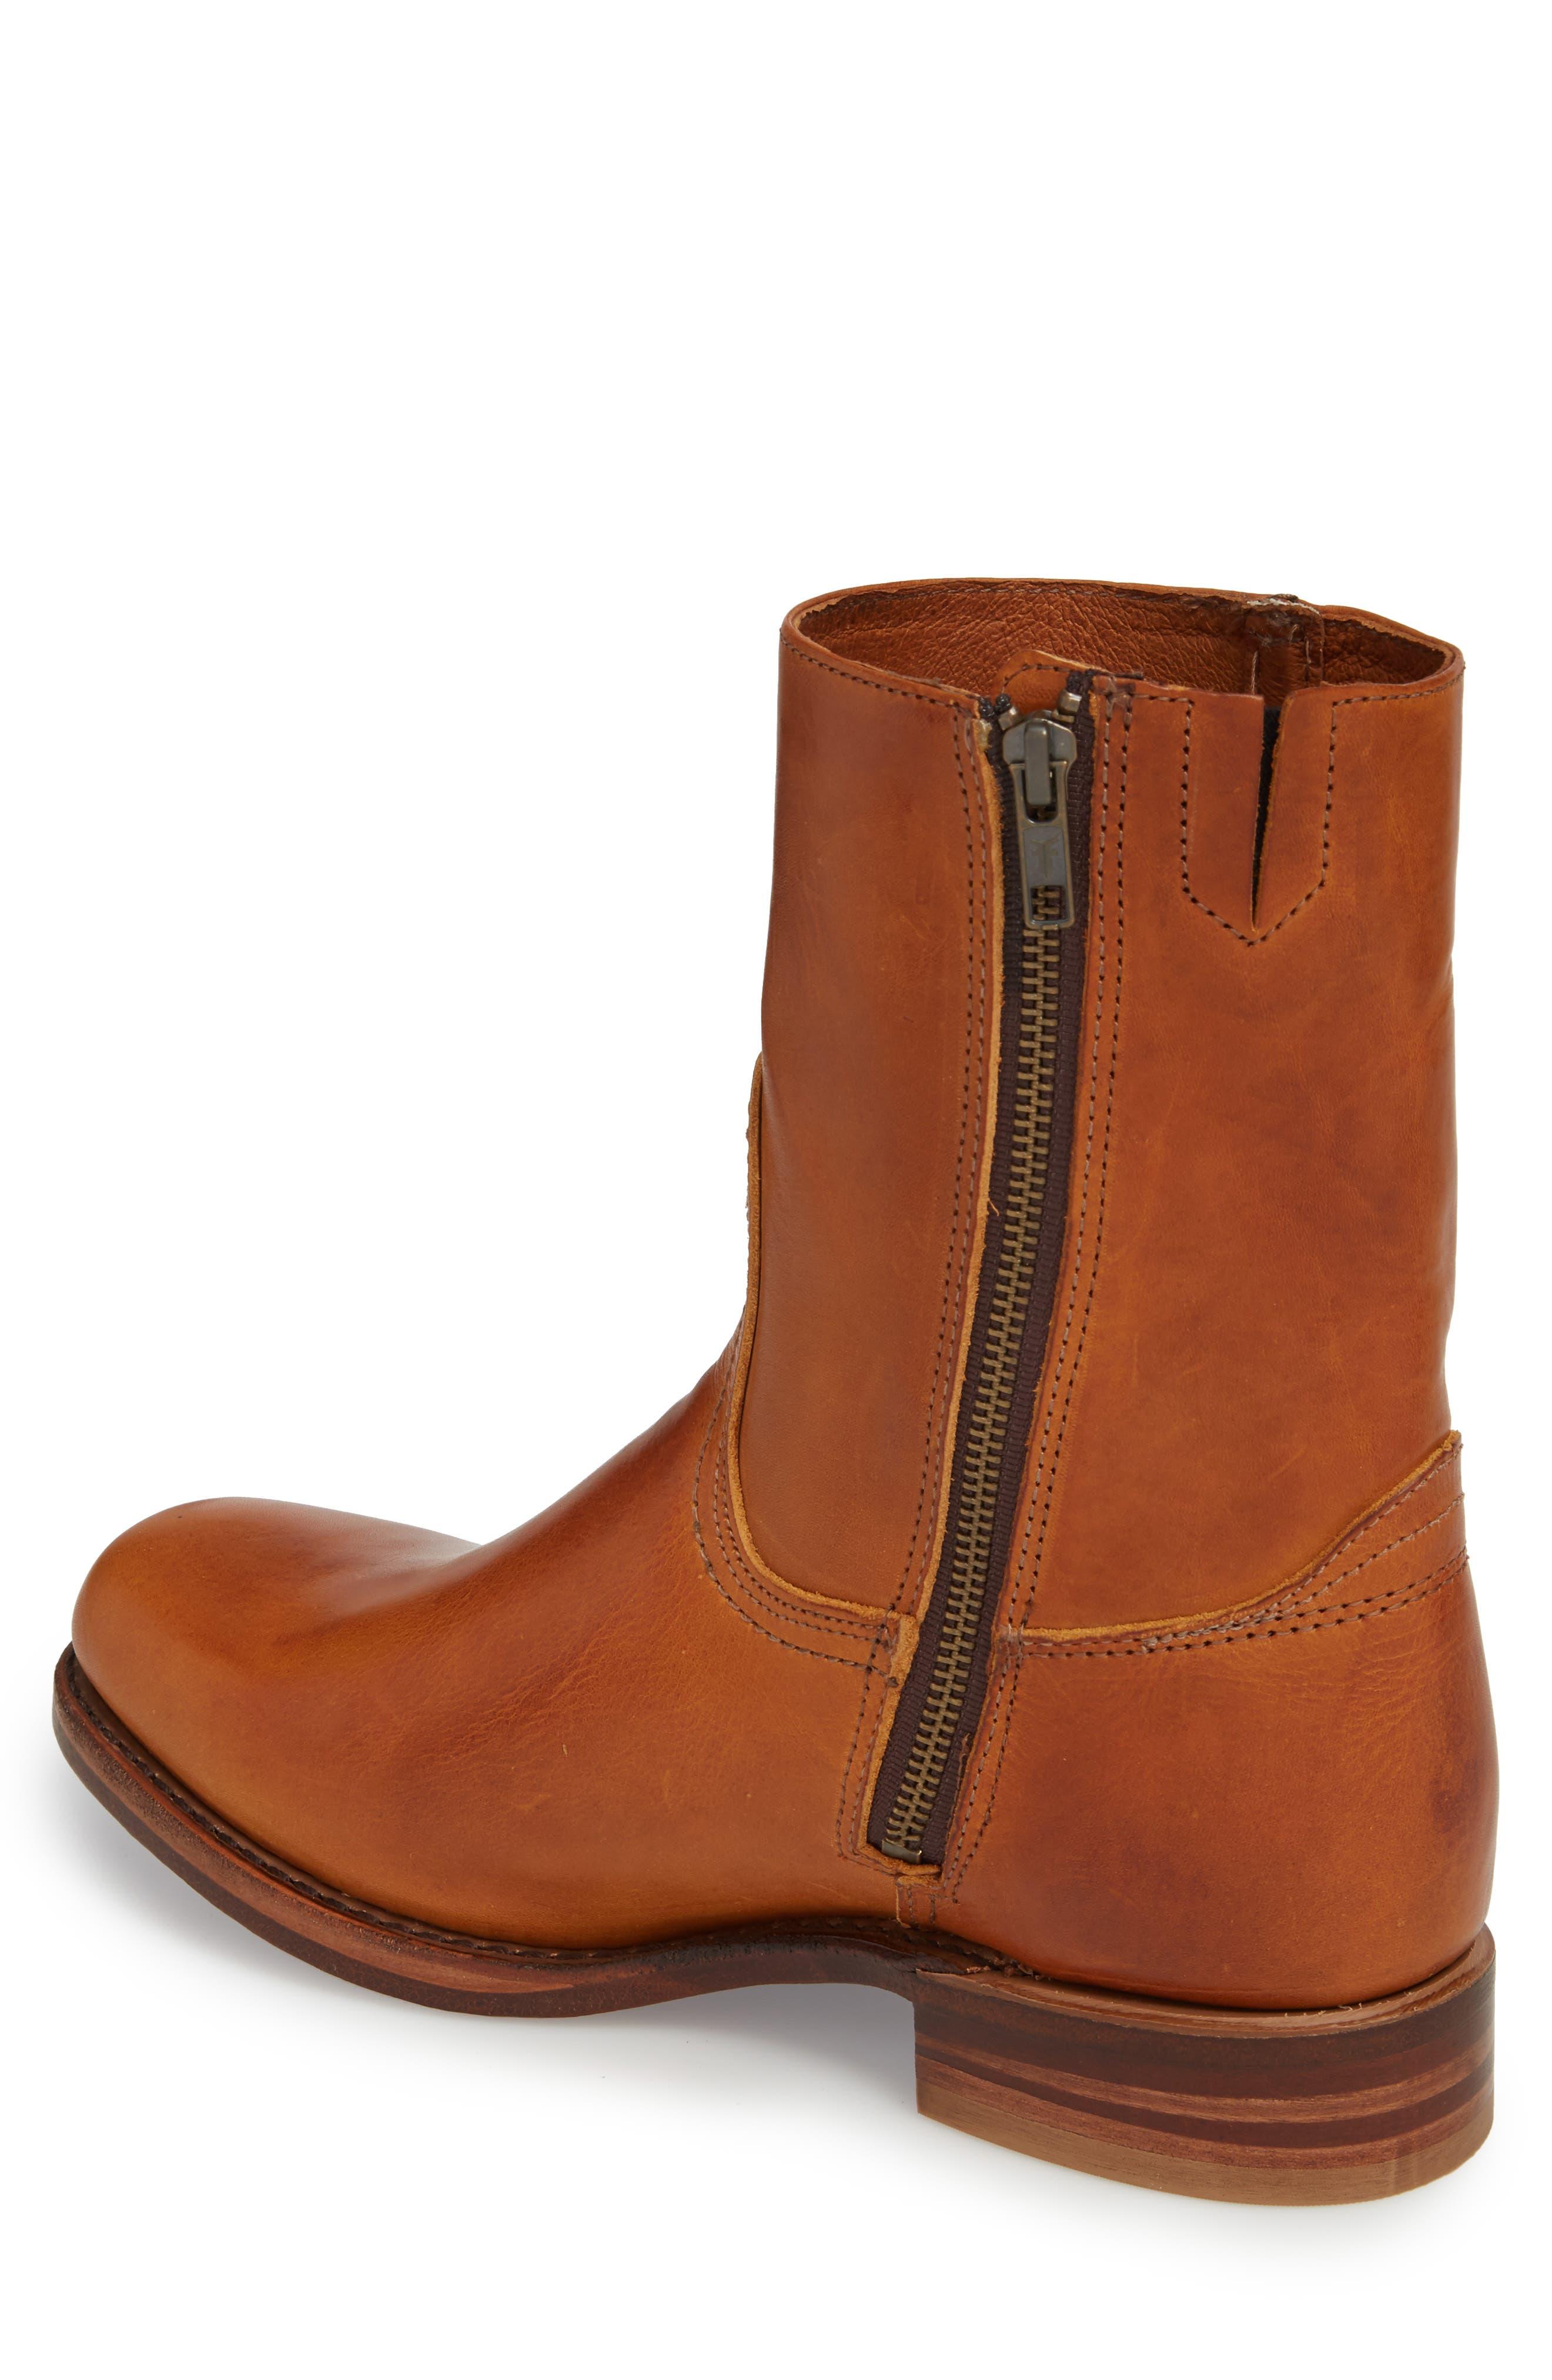 Campus Side Zip Boot,                             Alternate thumbnail 2, color,                             Cognac Leather